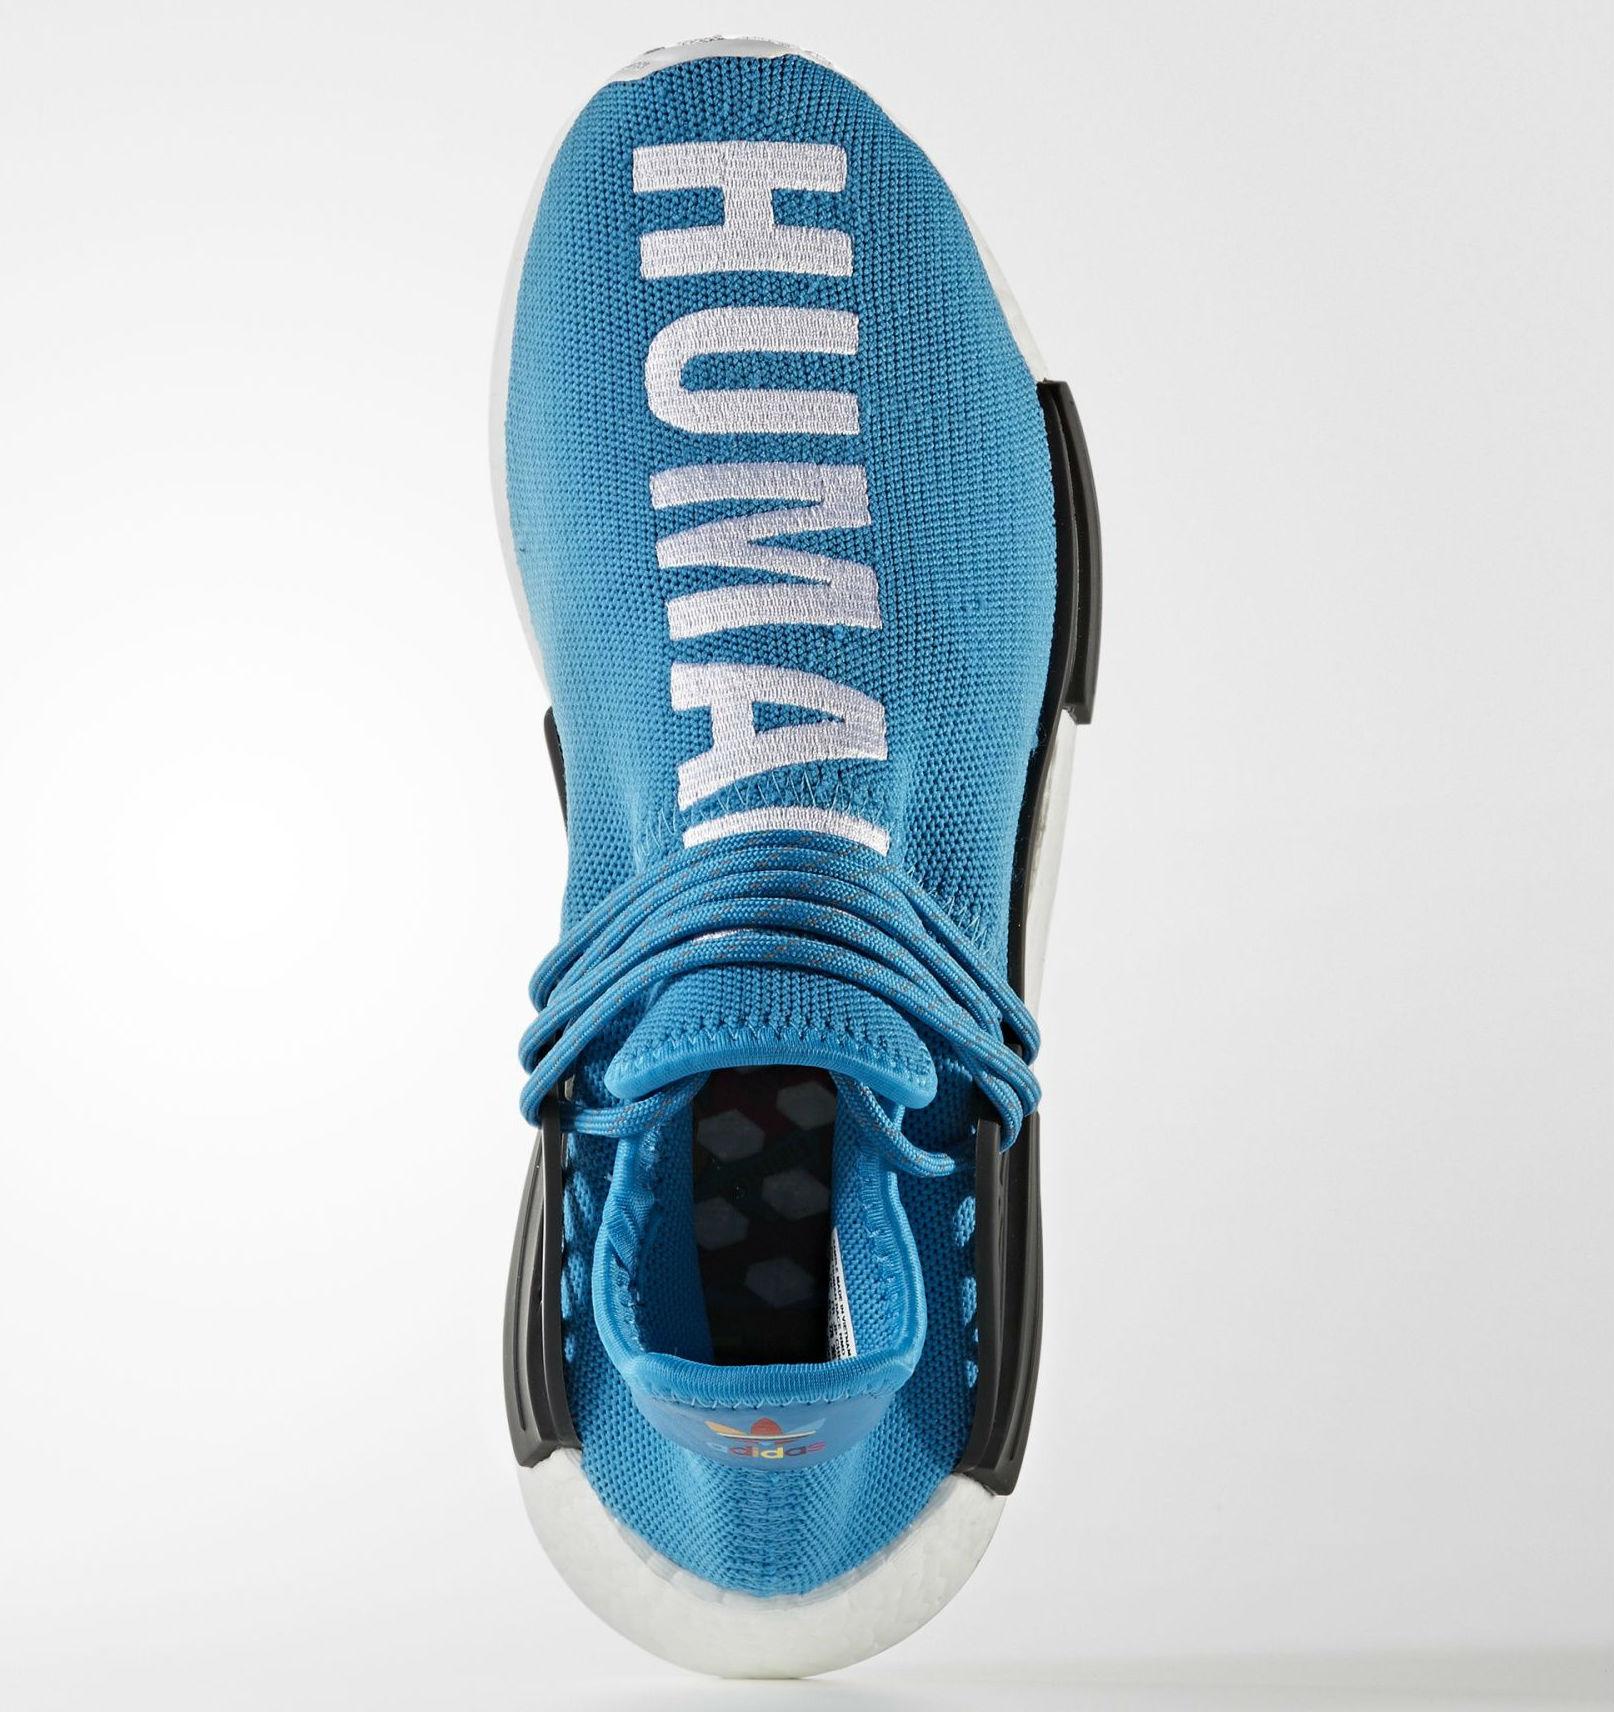 Blue Pharrell adidas NMD Human Race Top